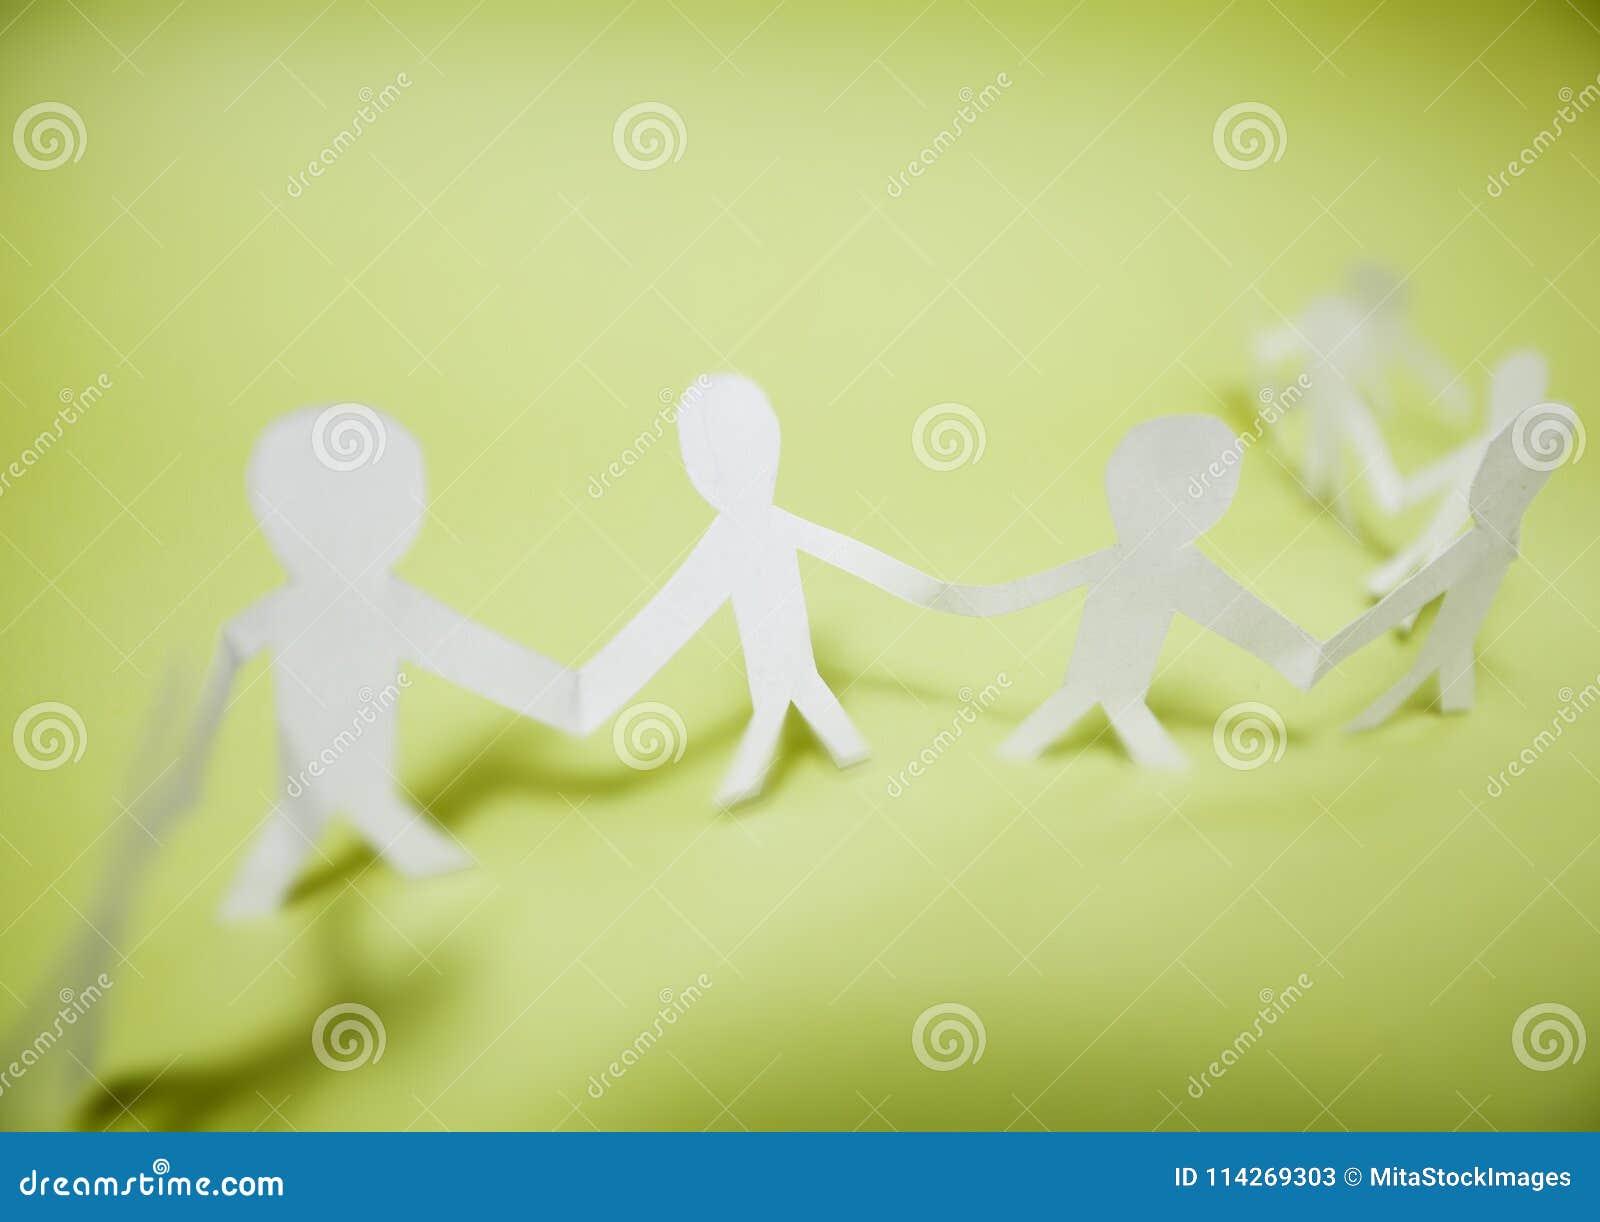 Verbonden steun samen